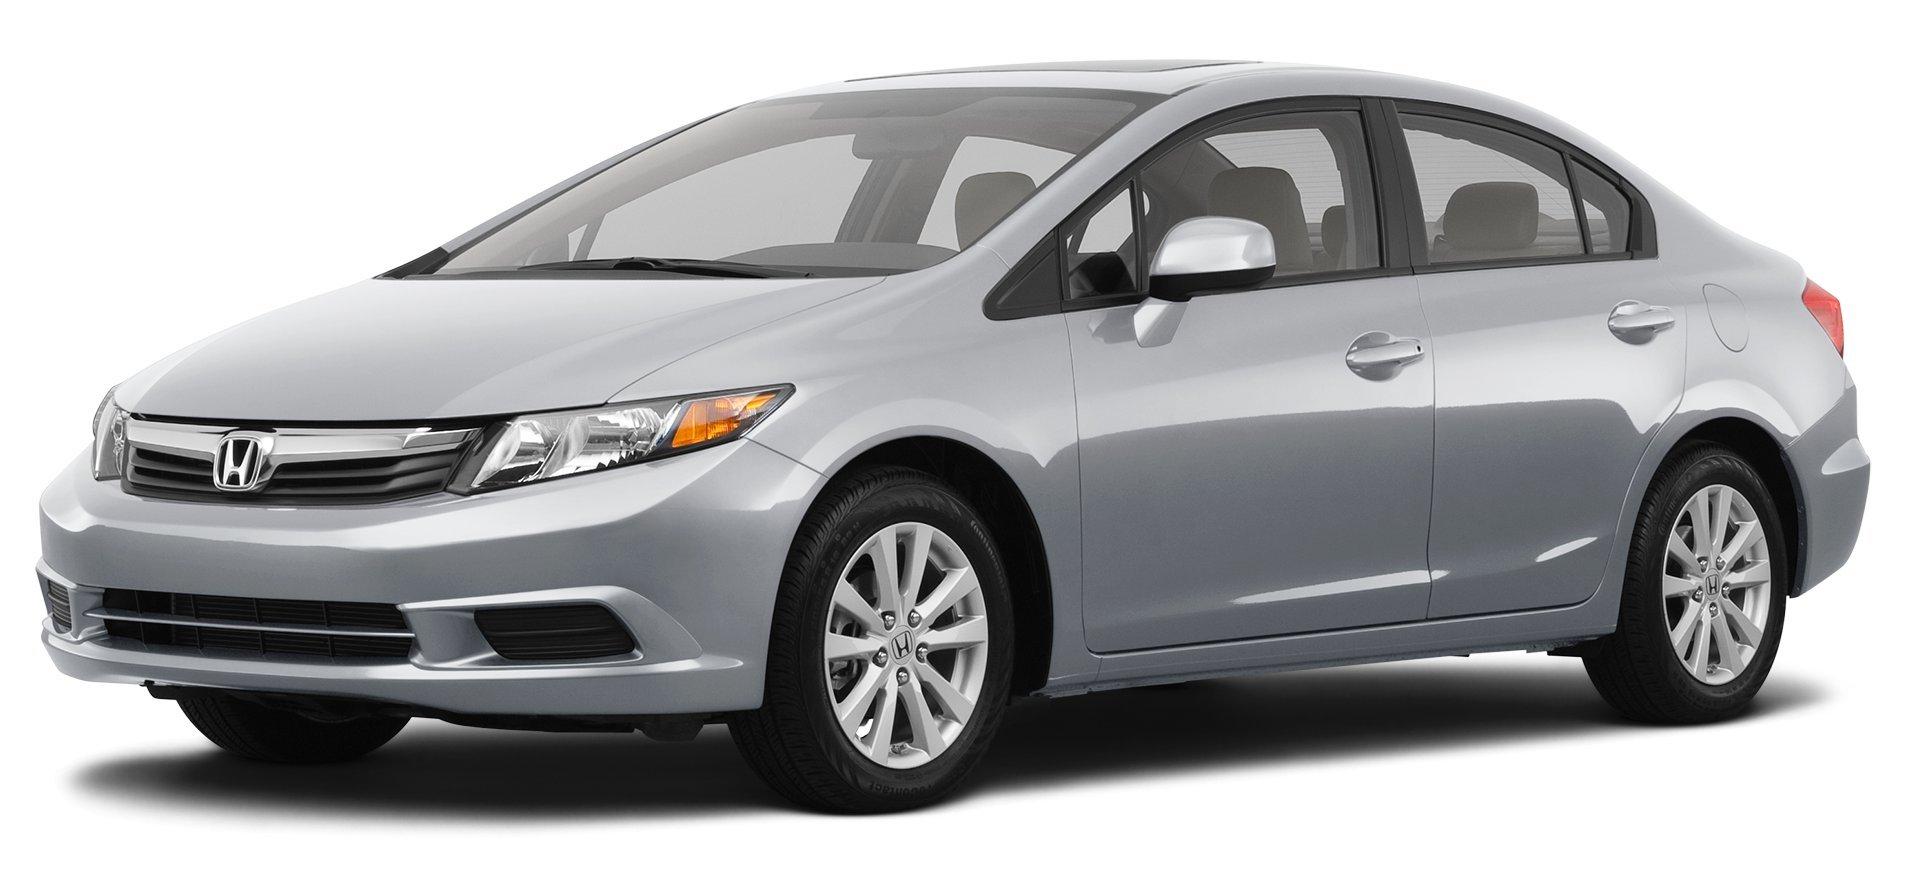 ... 2012 Honda Civic EX-L, 4-Door Automatic Transmission PZEV ...